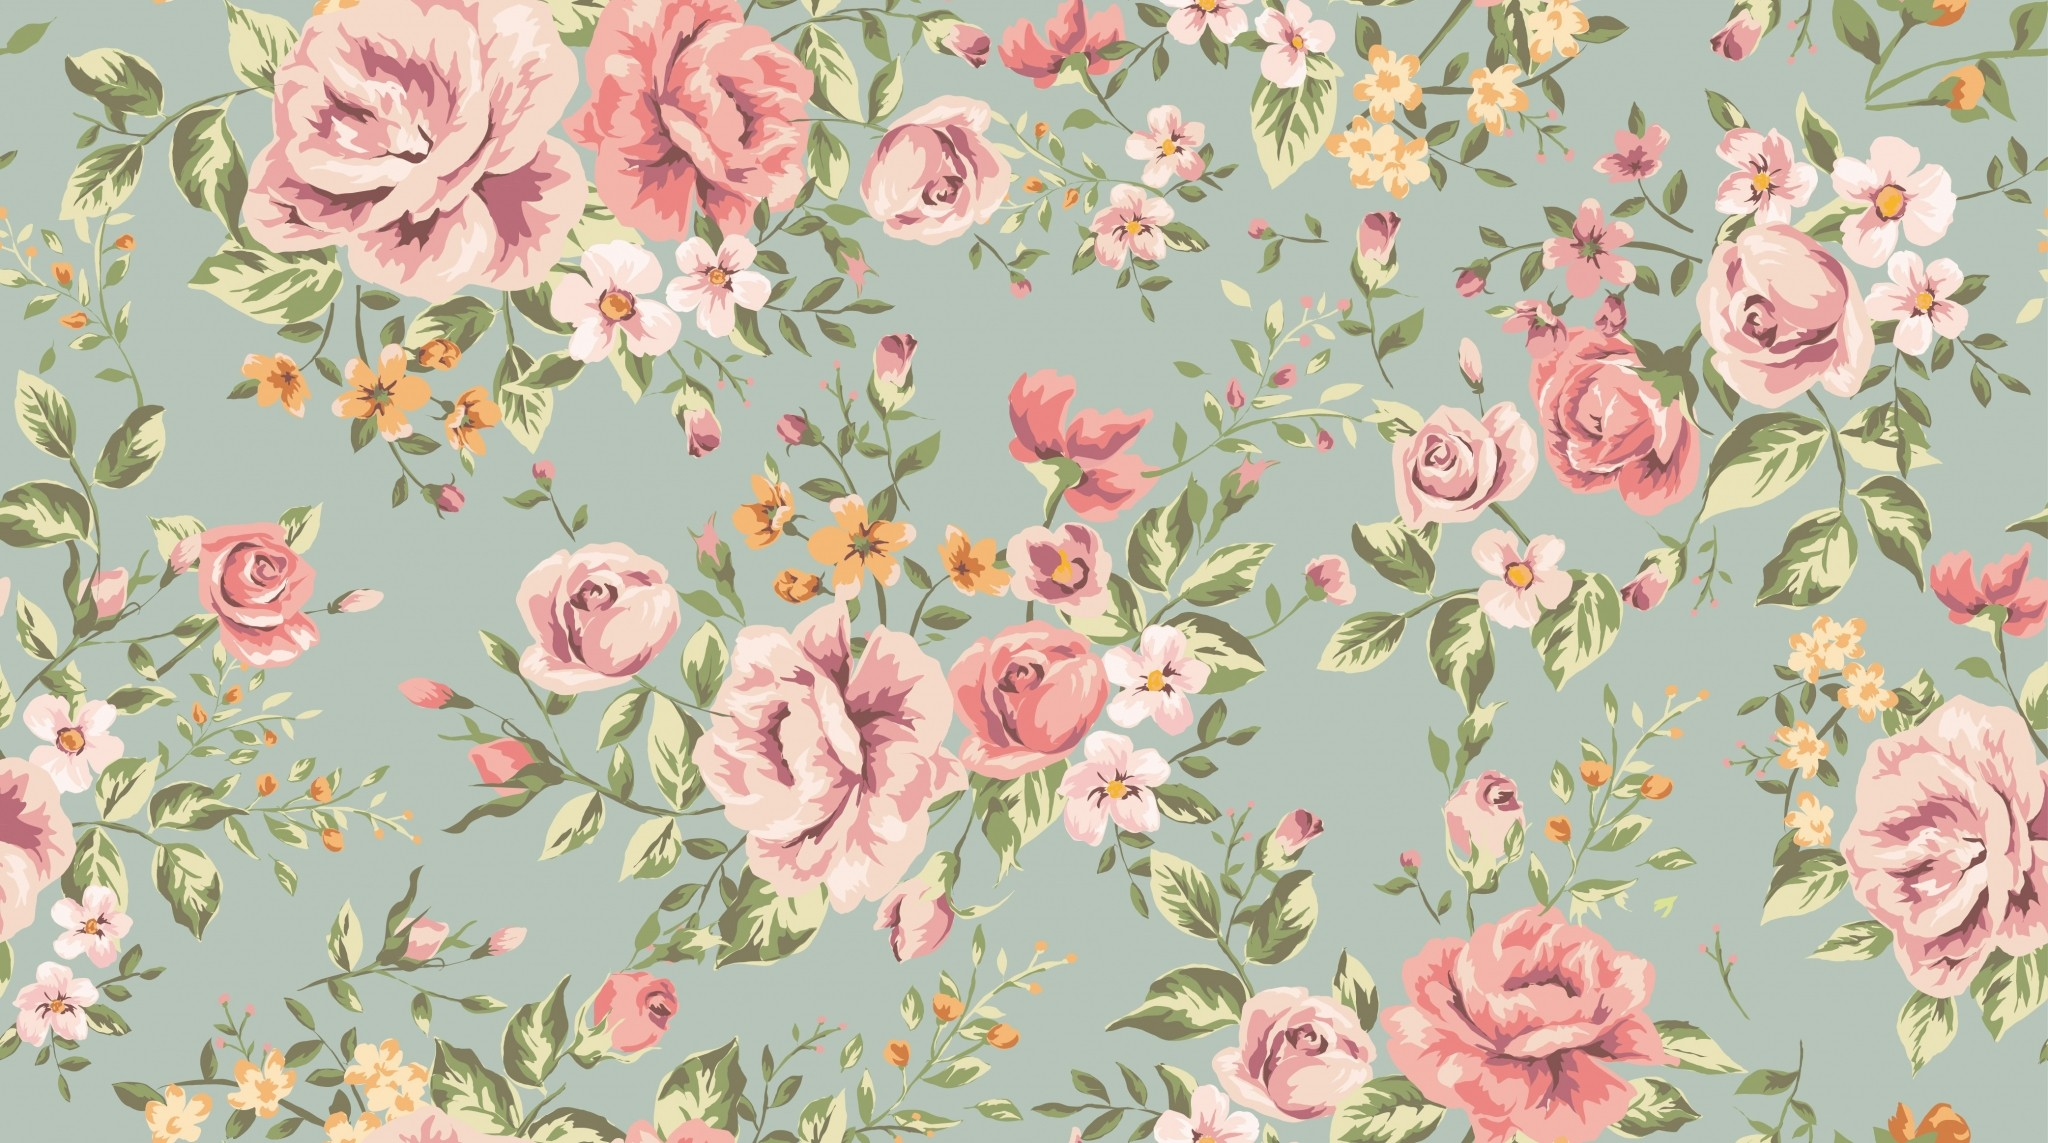 Vintage Floral Background 1 Download Free Cool Full Hd